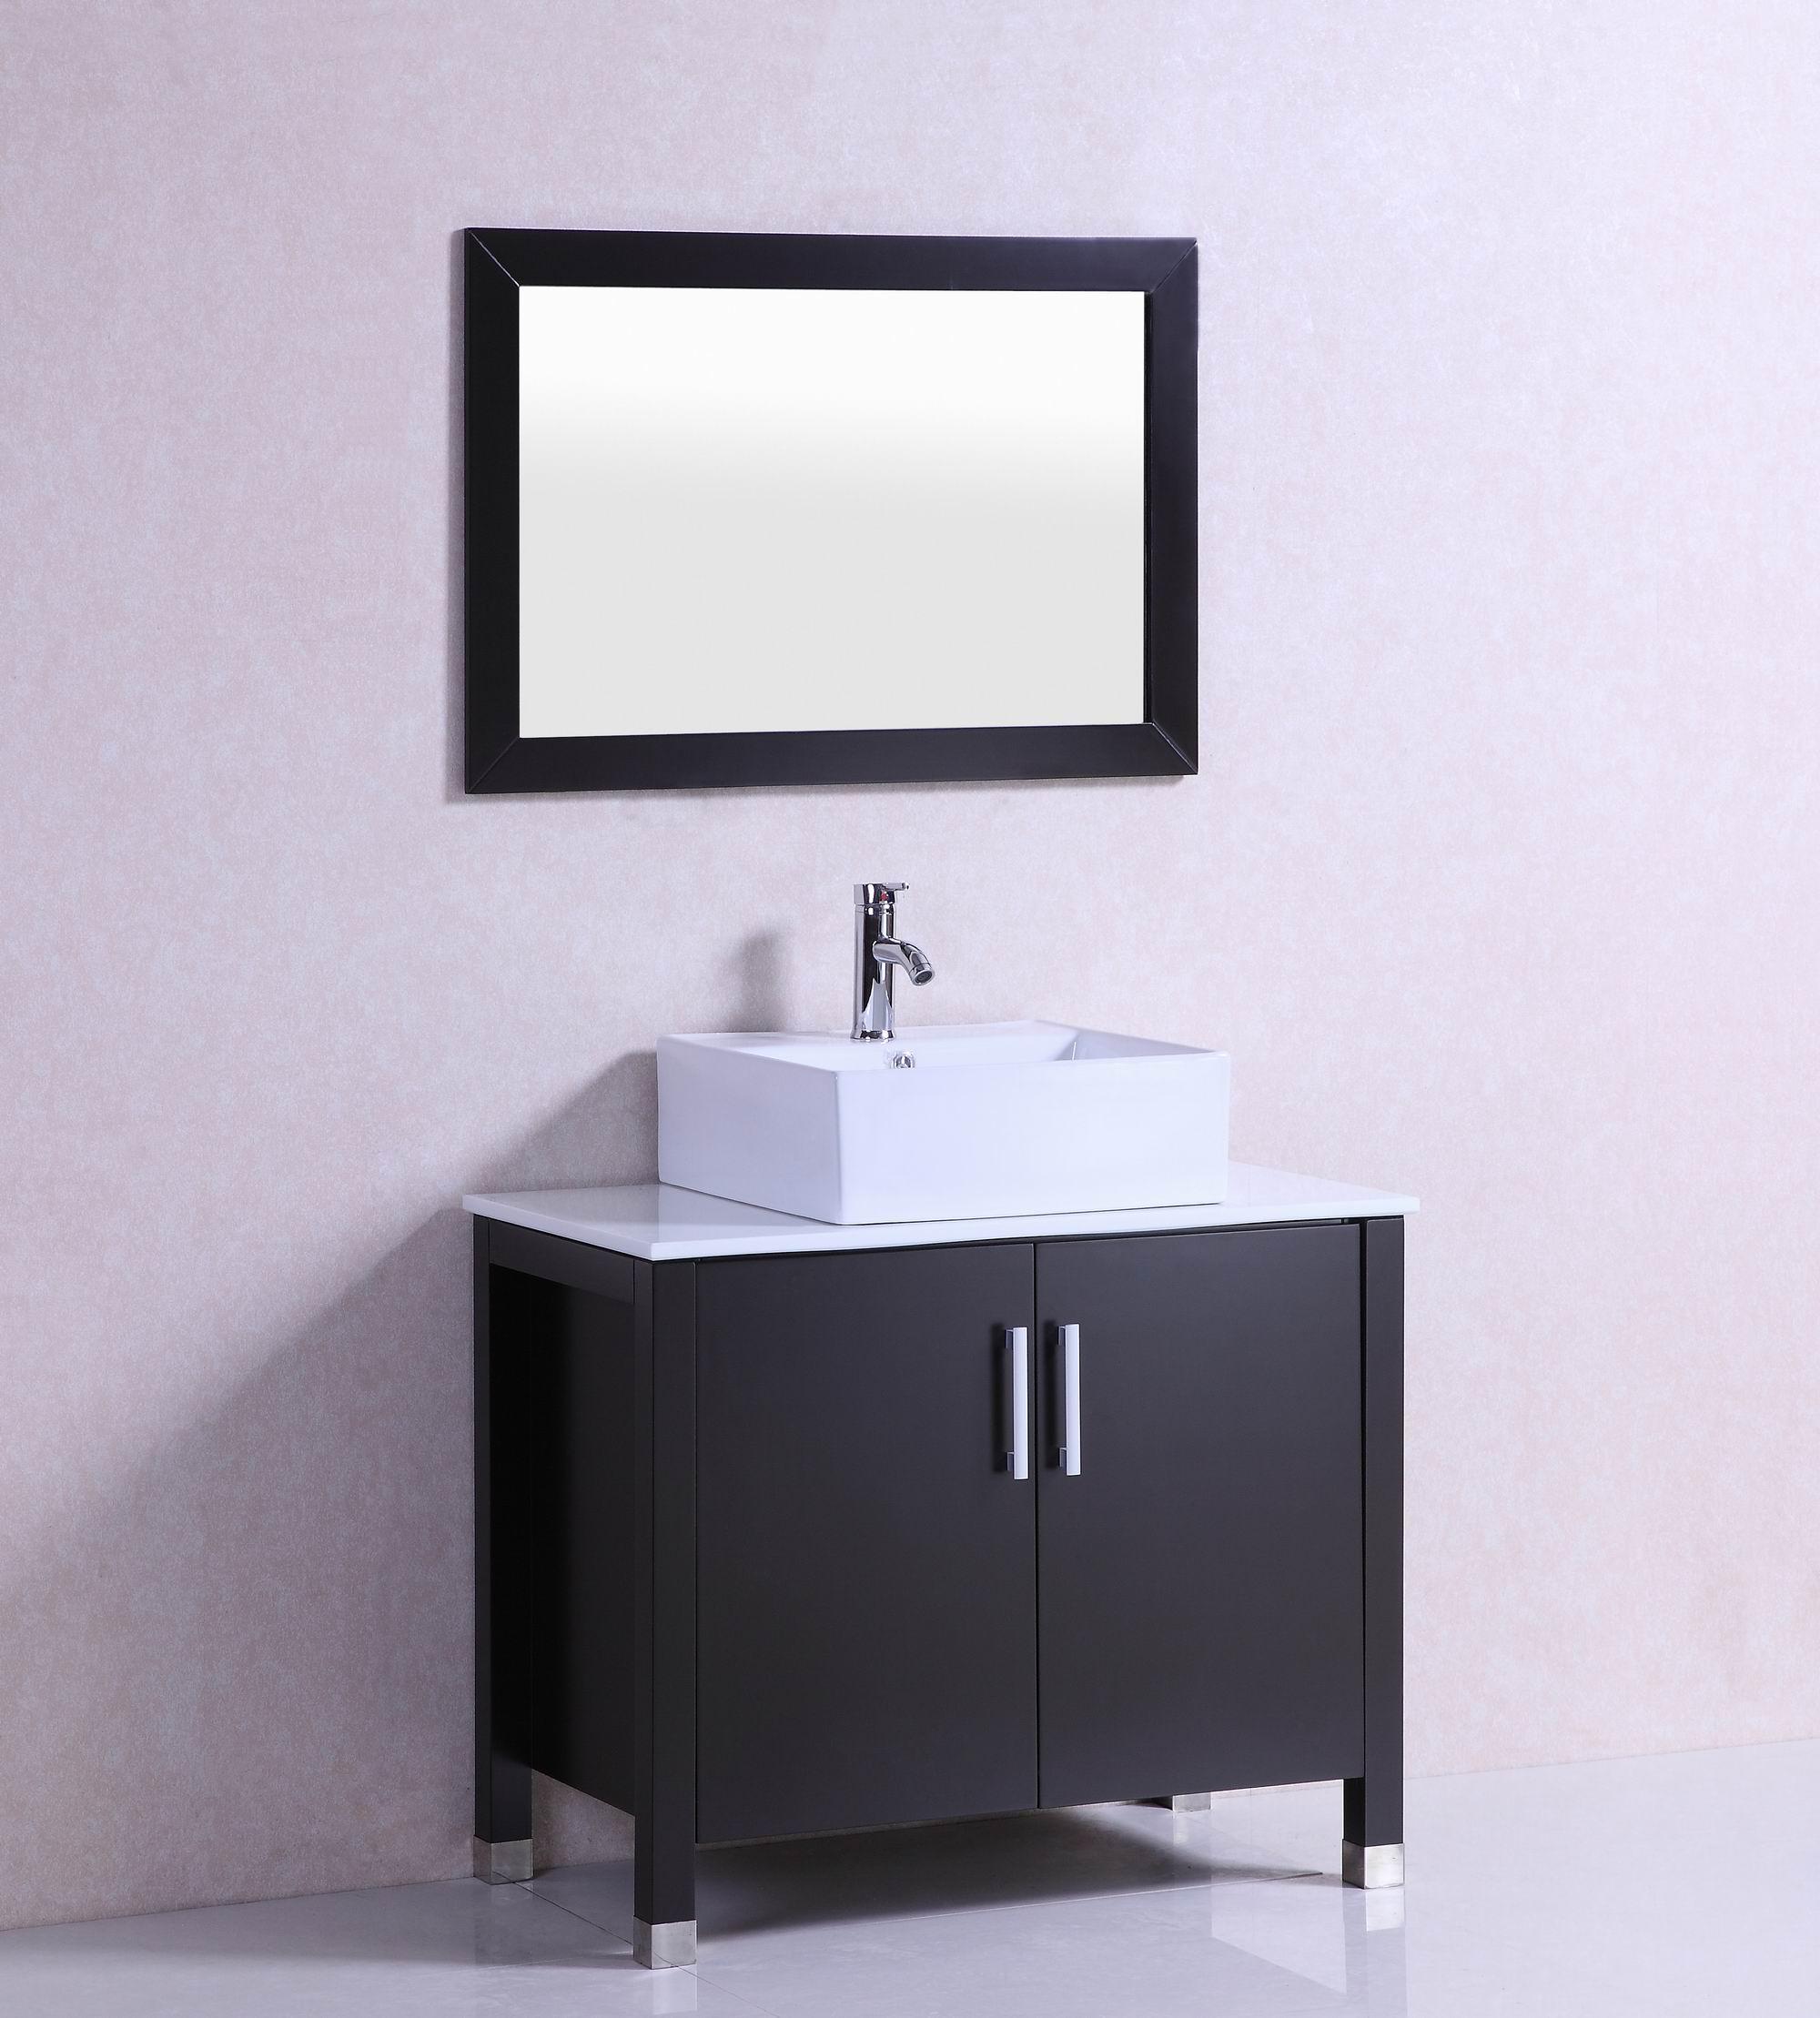 Shop 36 inch belvedere modern freestanding espresso bathroom vanity with vessel sink on sale for 36 inch espresso bathroom vanity